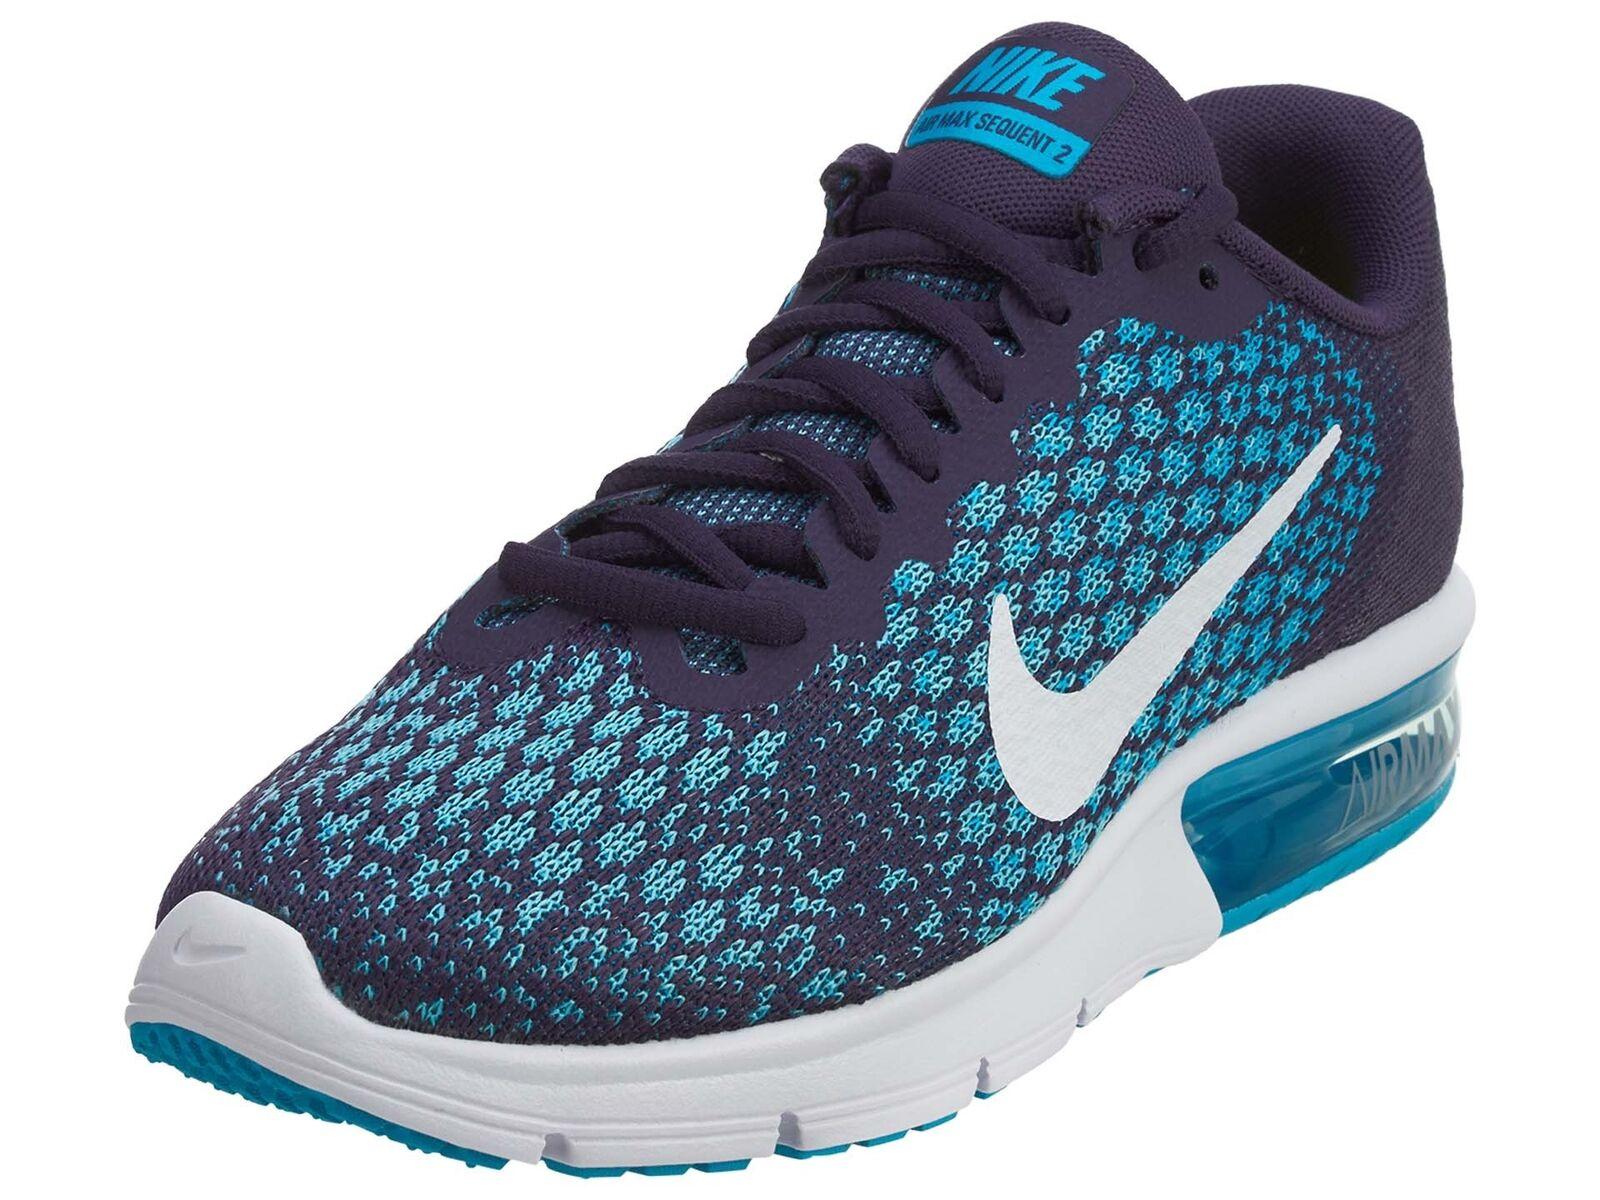 Nike air max weitere 2 frauen schuhe schuhe schuhe dunkel - / Weiß 7,5 b (m) 431ded